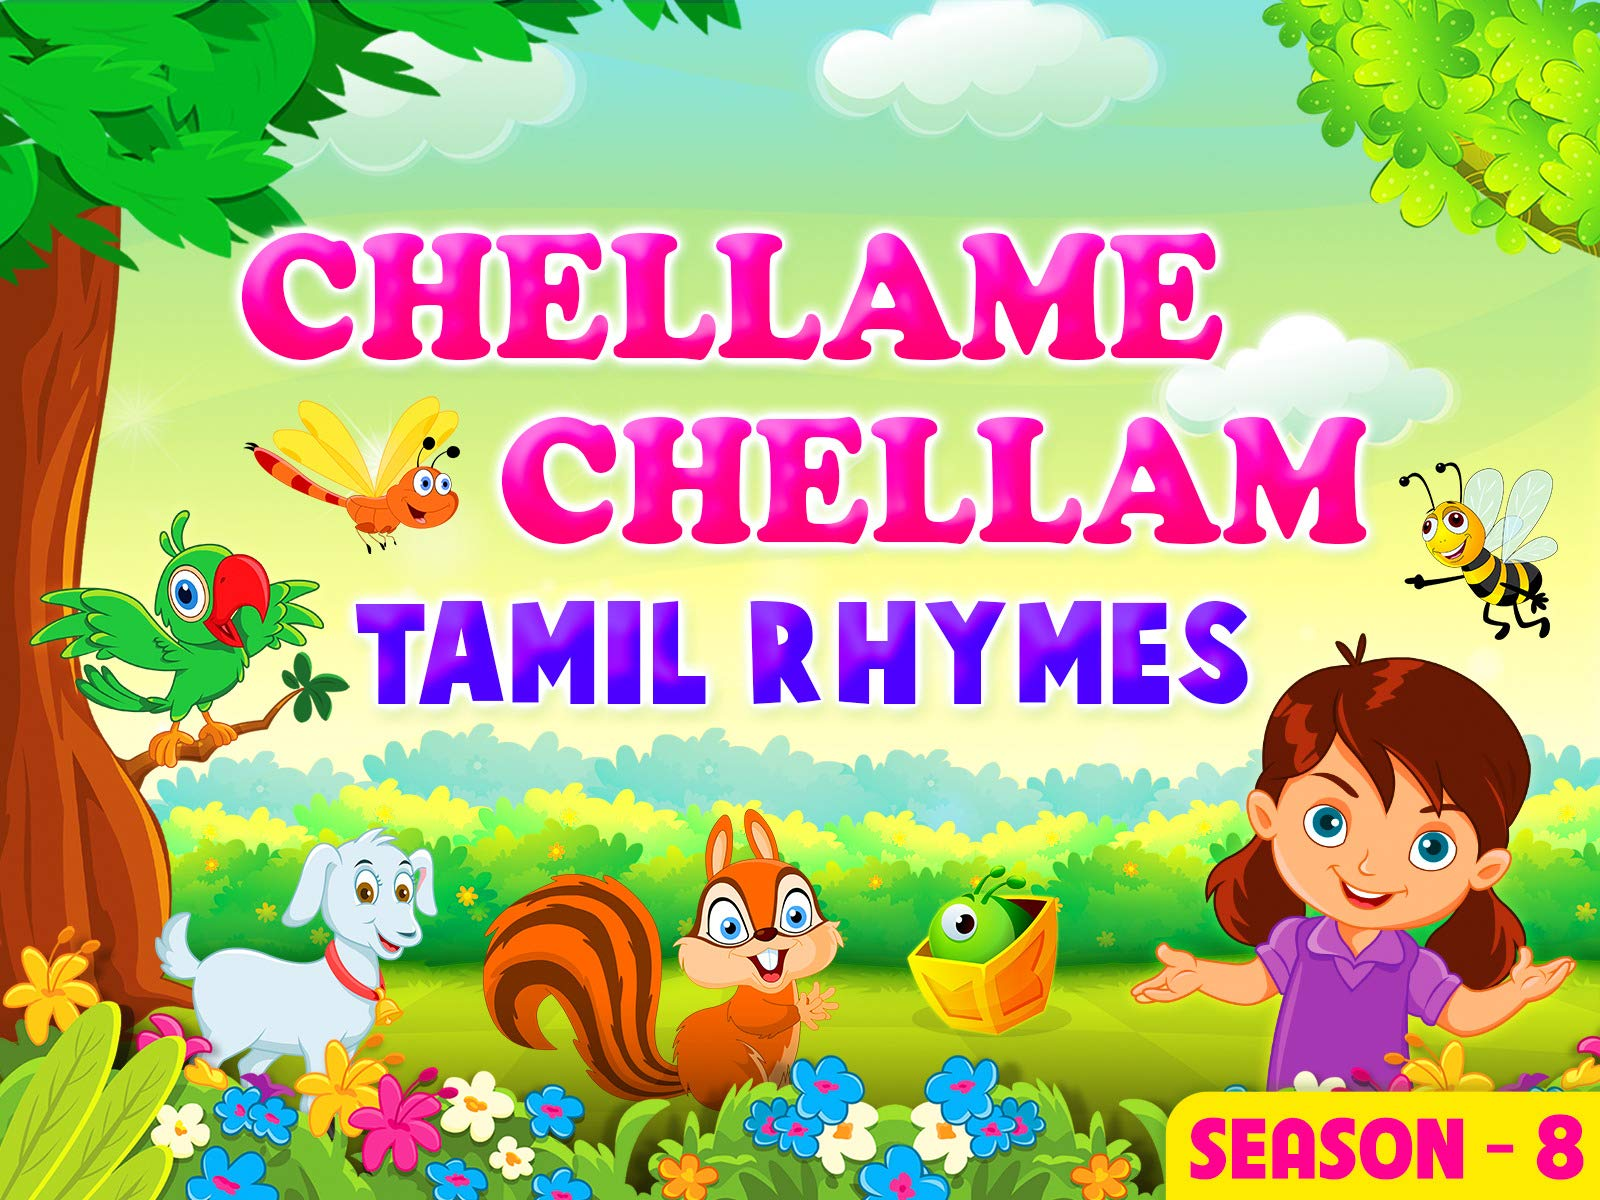 Chellame Chellam - Season 8